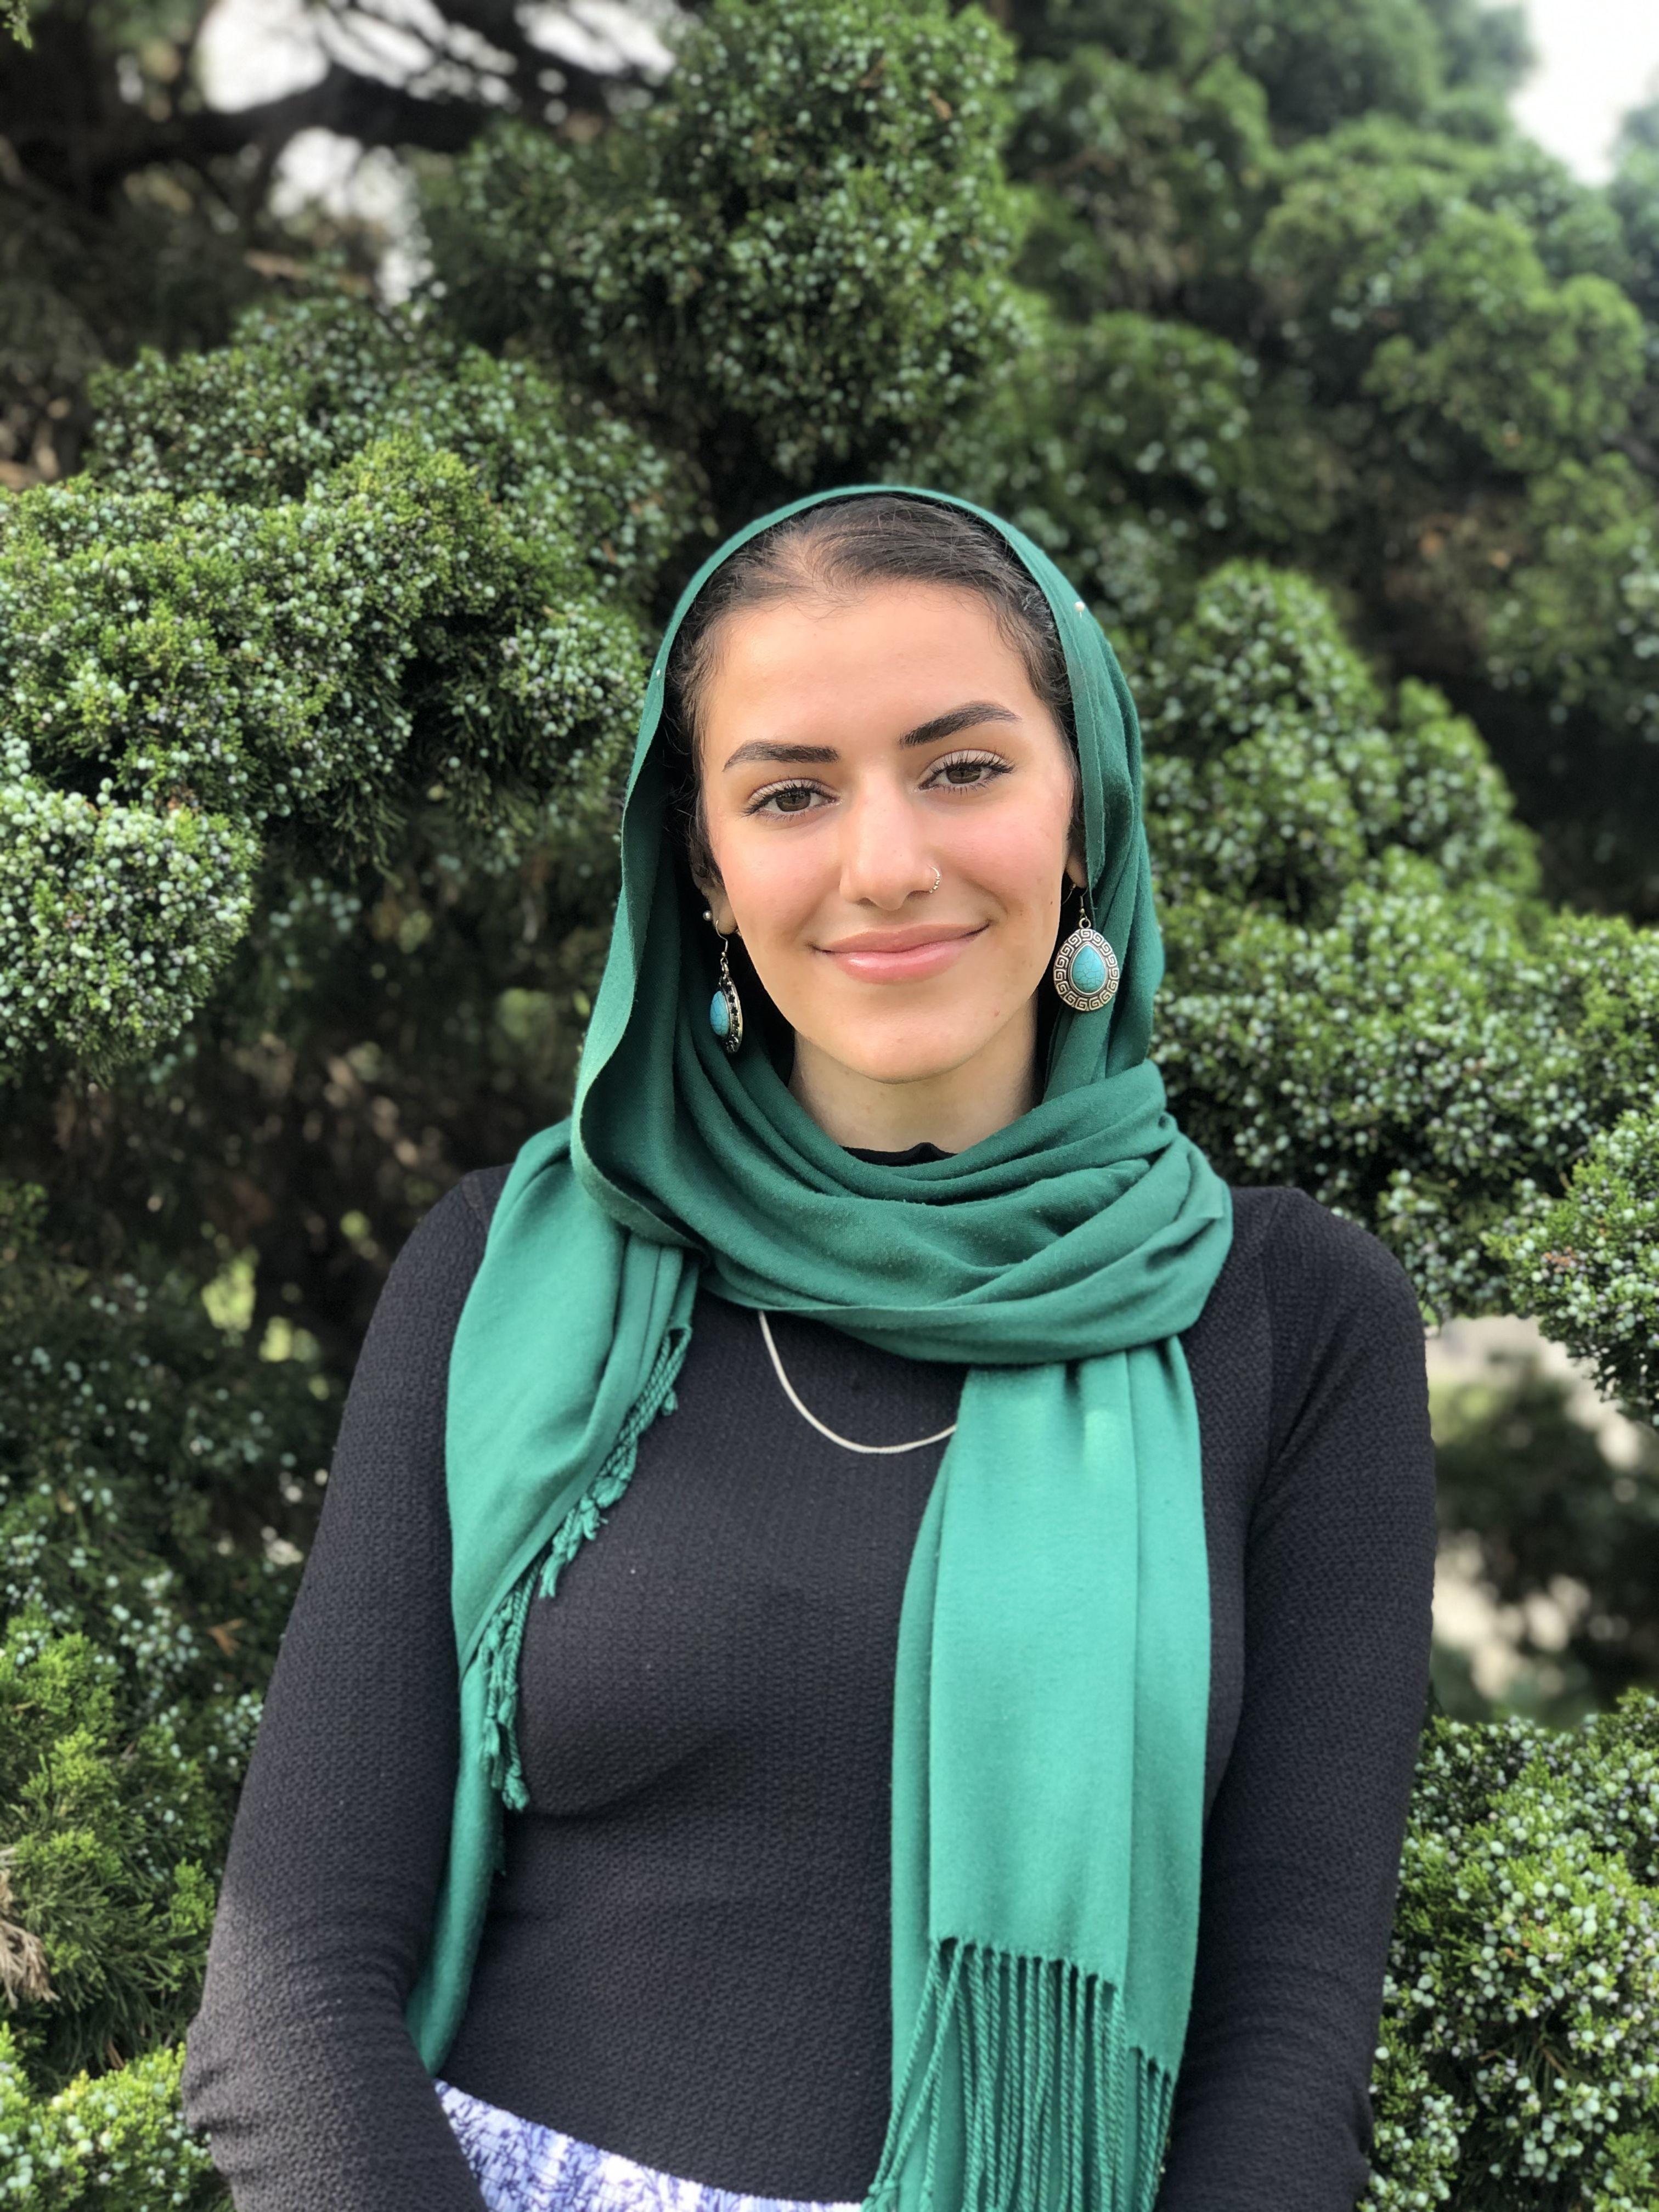 Meet Noor, our summer Anytown intern!